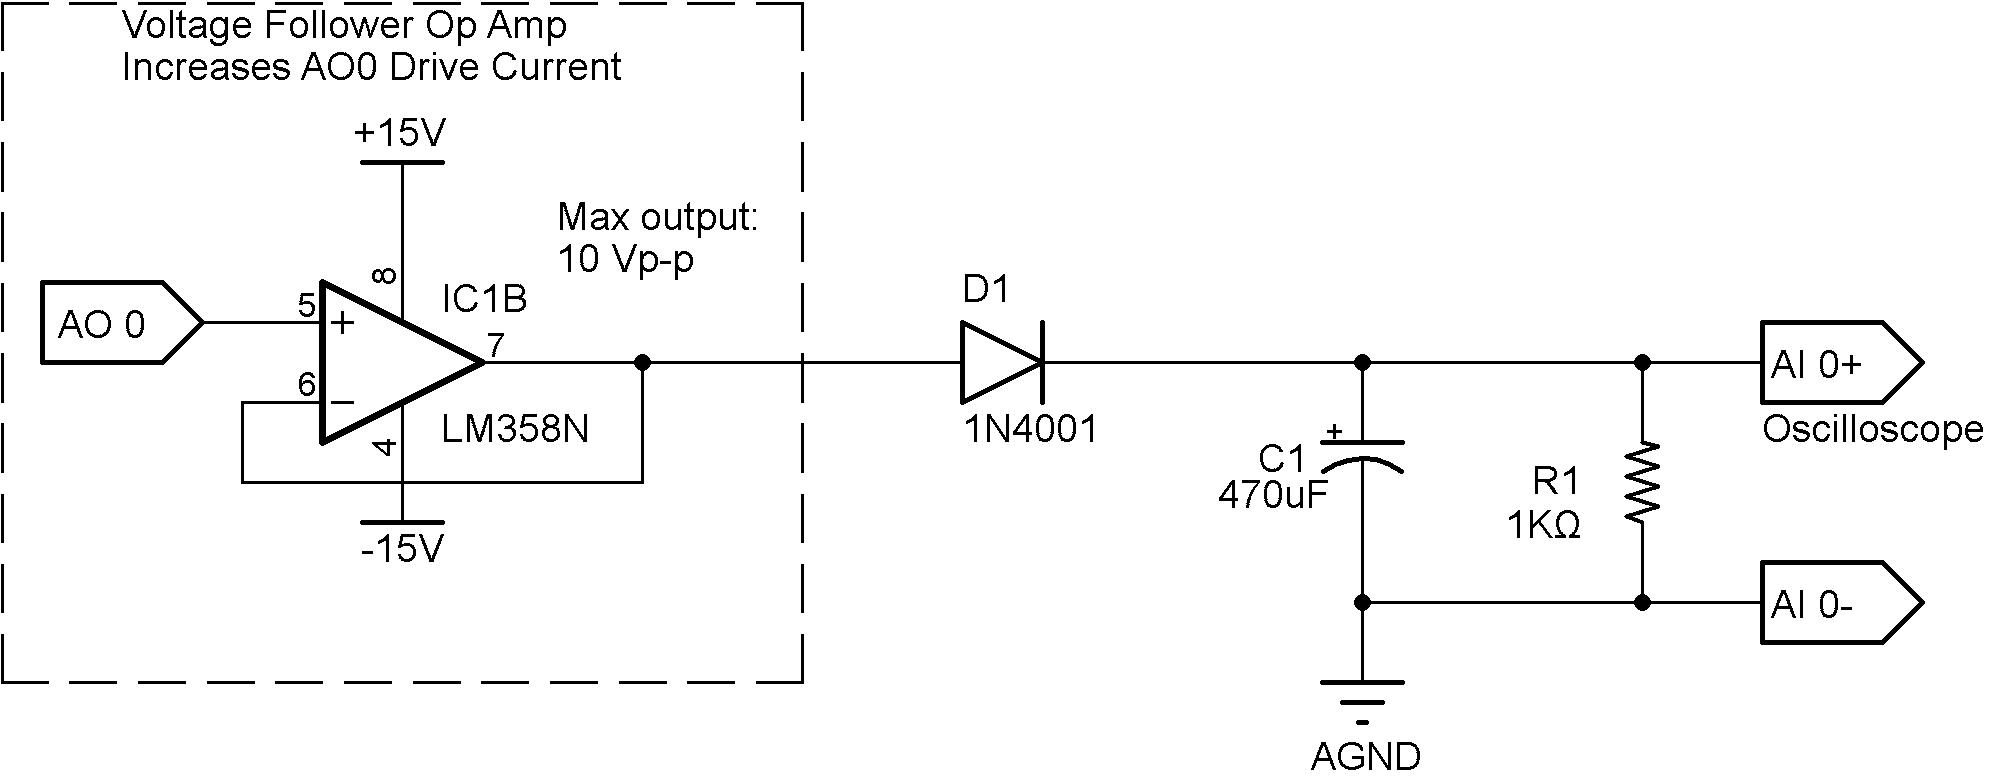 myDAQ tutorial: Increase analog output (AO) current drive